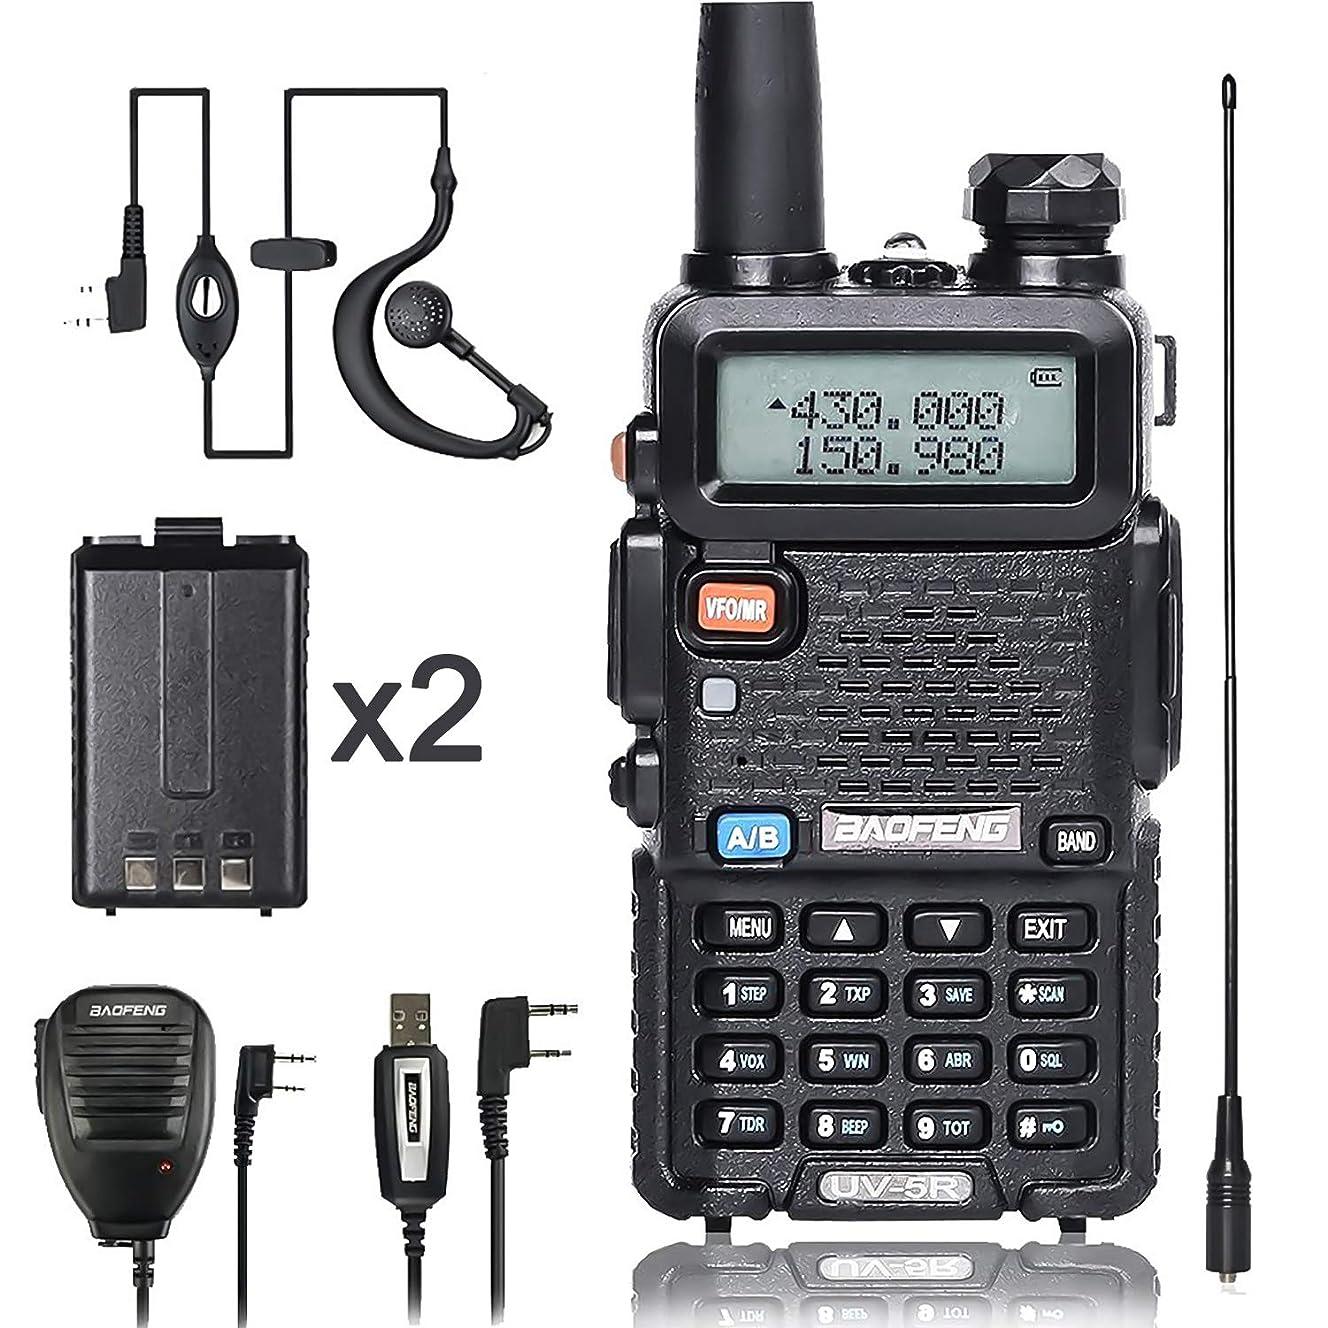 BaoFeng Walkie Talkie UV-5R Dual Band Two Way Radio with one more 1800mAh UV5R Battery one Hand Mic and one TIDRADIO NA-771 Antenna Baofeng Radio Ham radio